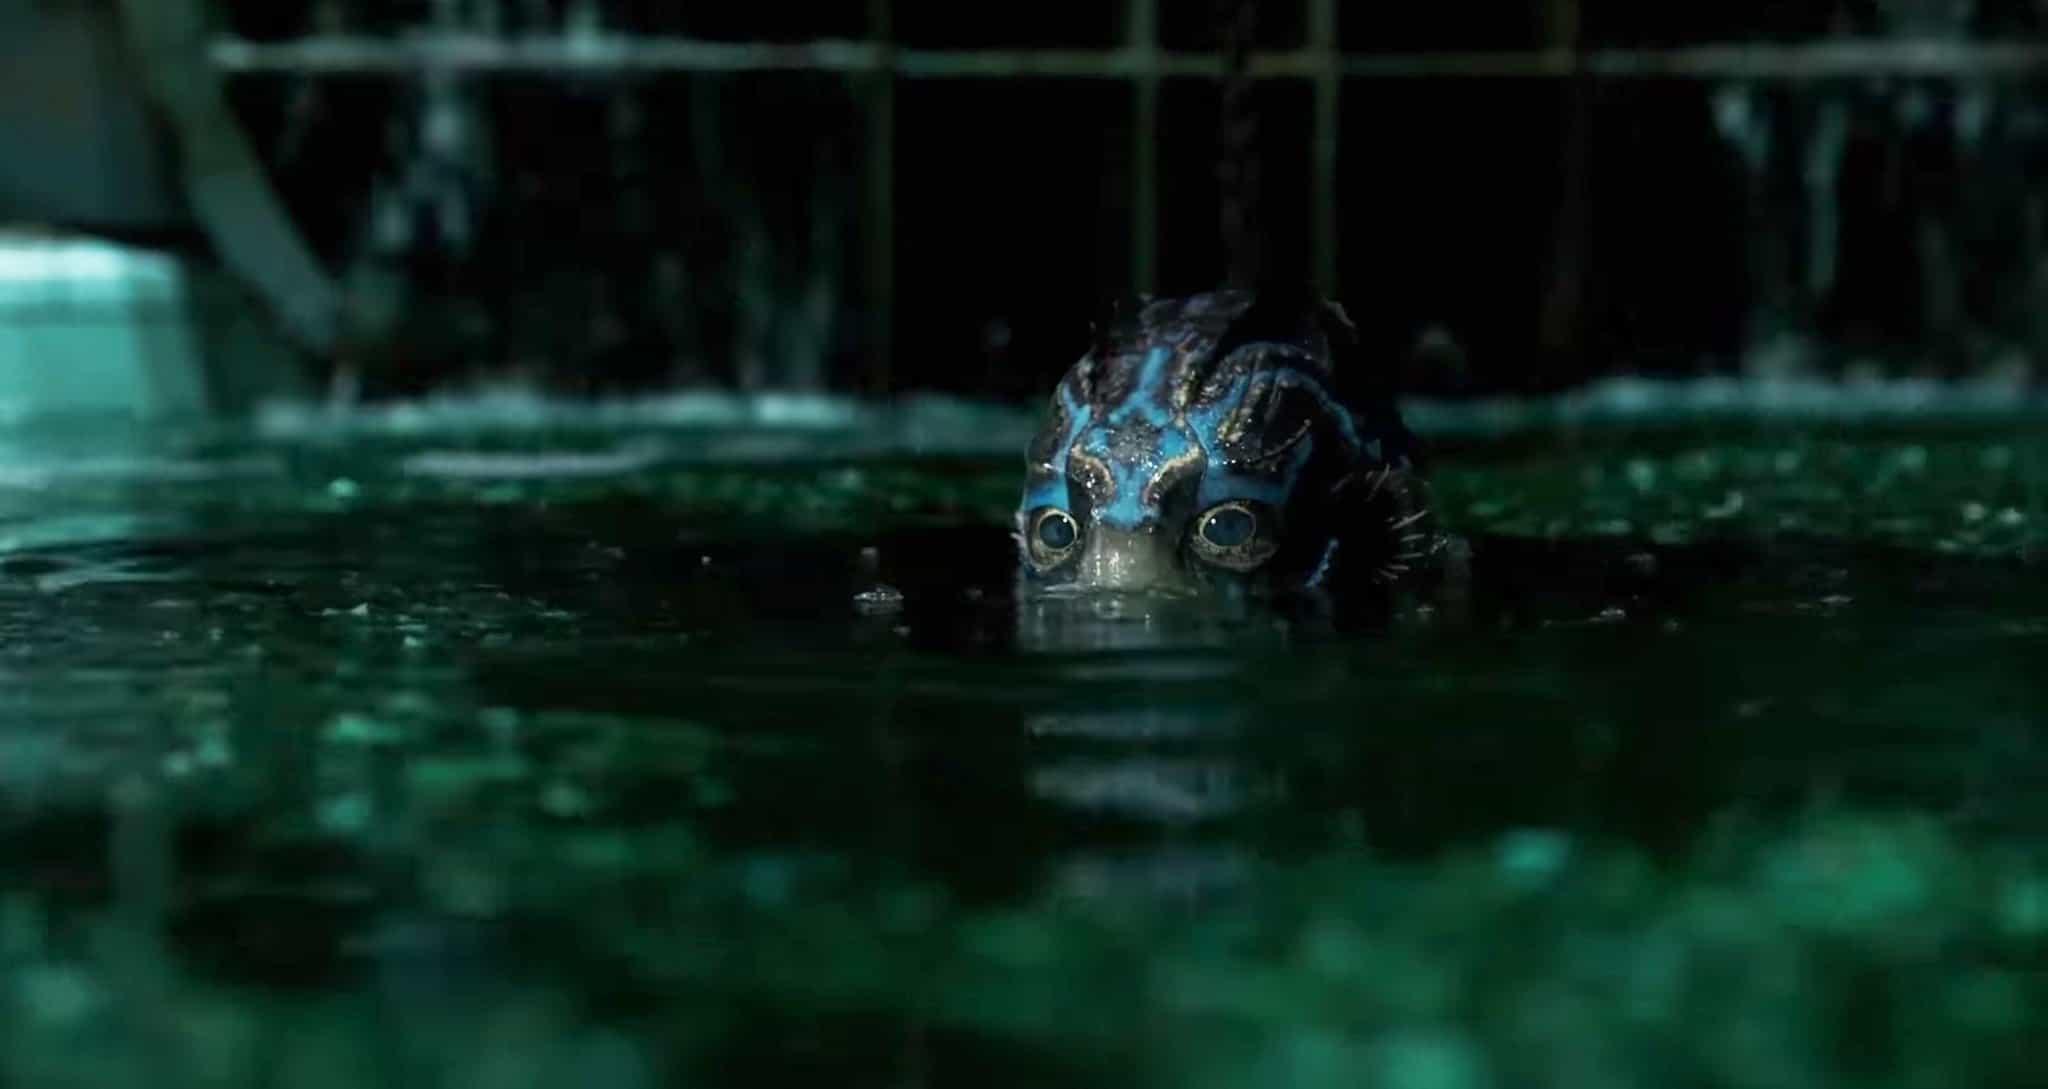 Guillermo del Toro no plagió idea para La forma del agua: FOX